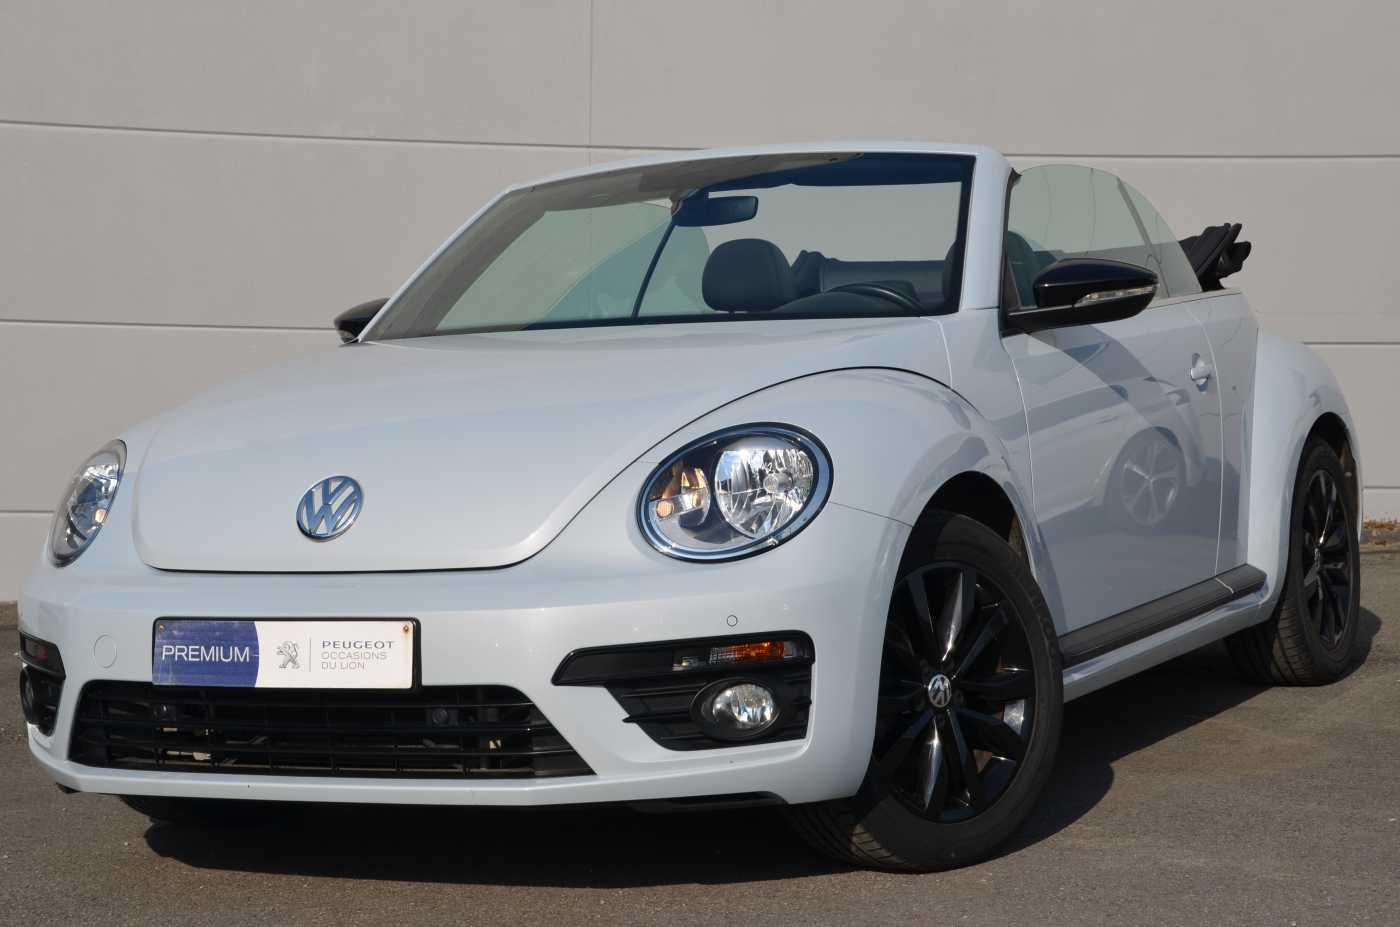 Volkswagen Beetle Mark 2 (2011) 1.2 TSI 1/12